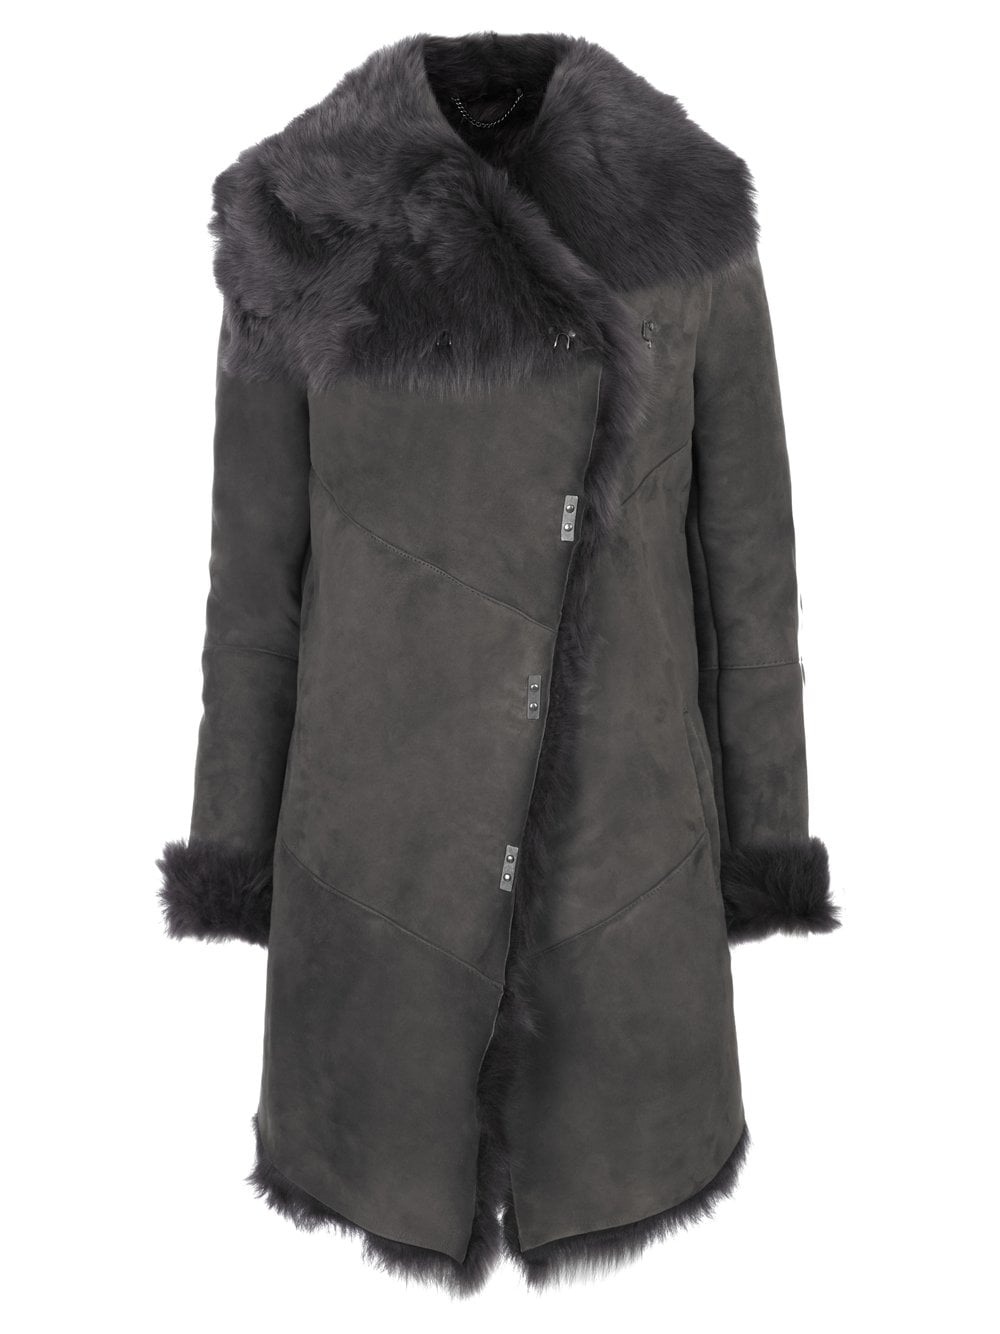 Shearling Coat in Storm Grey